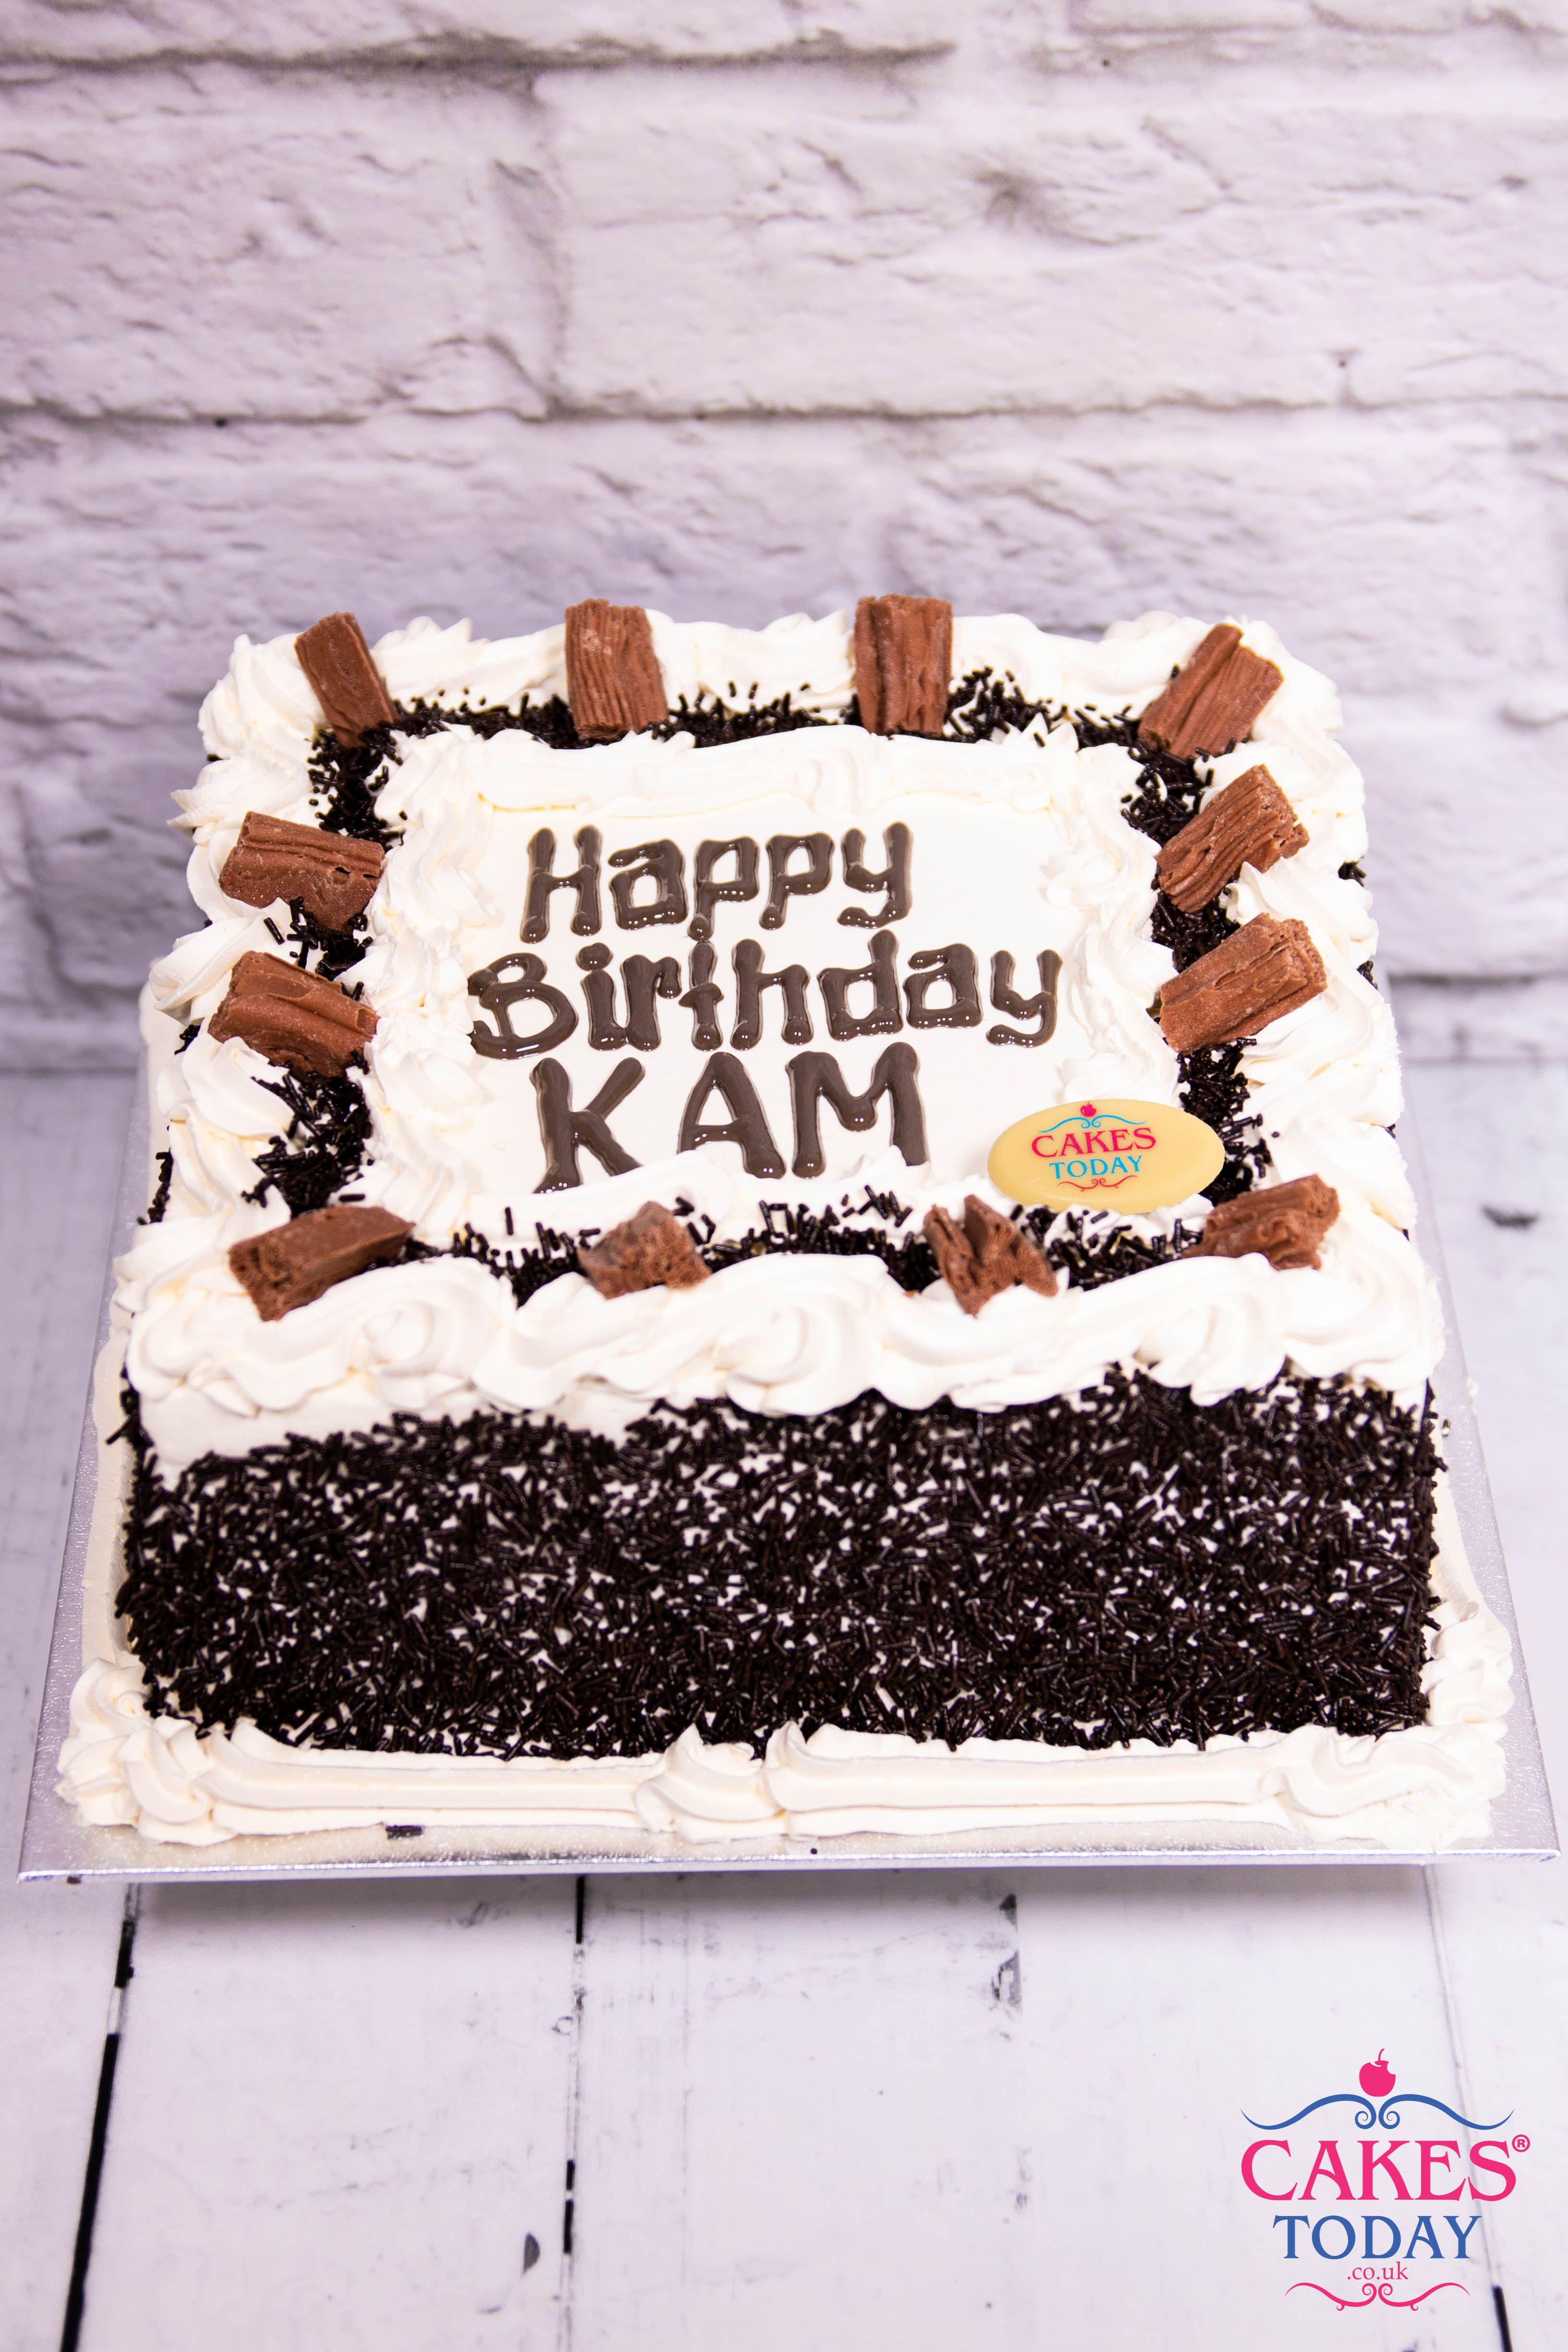 Our Chocolate Flakes Sprinkles Celebration Cake Is A Customer Favourite CakesToday BirthdayCake London